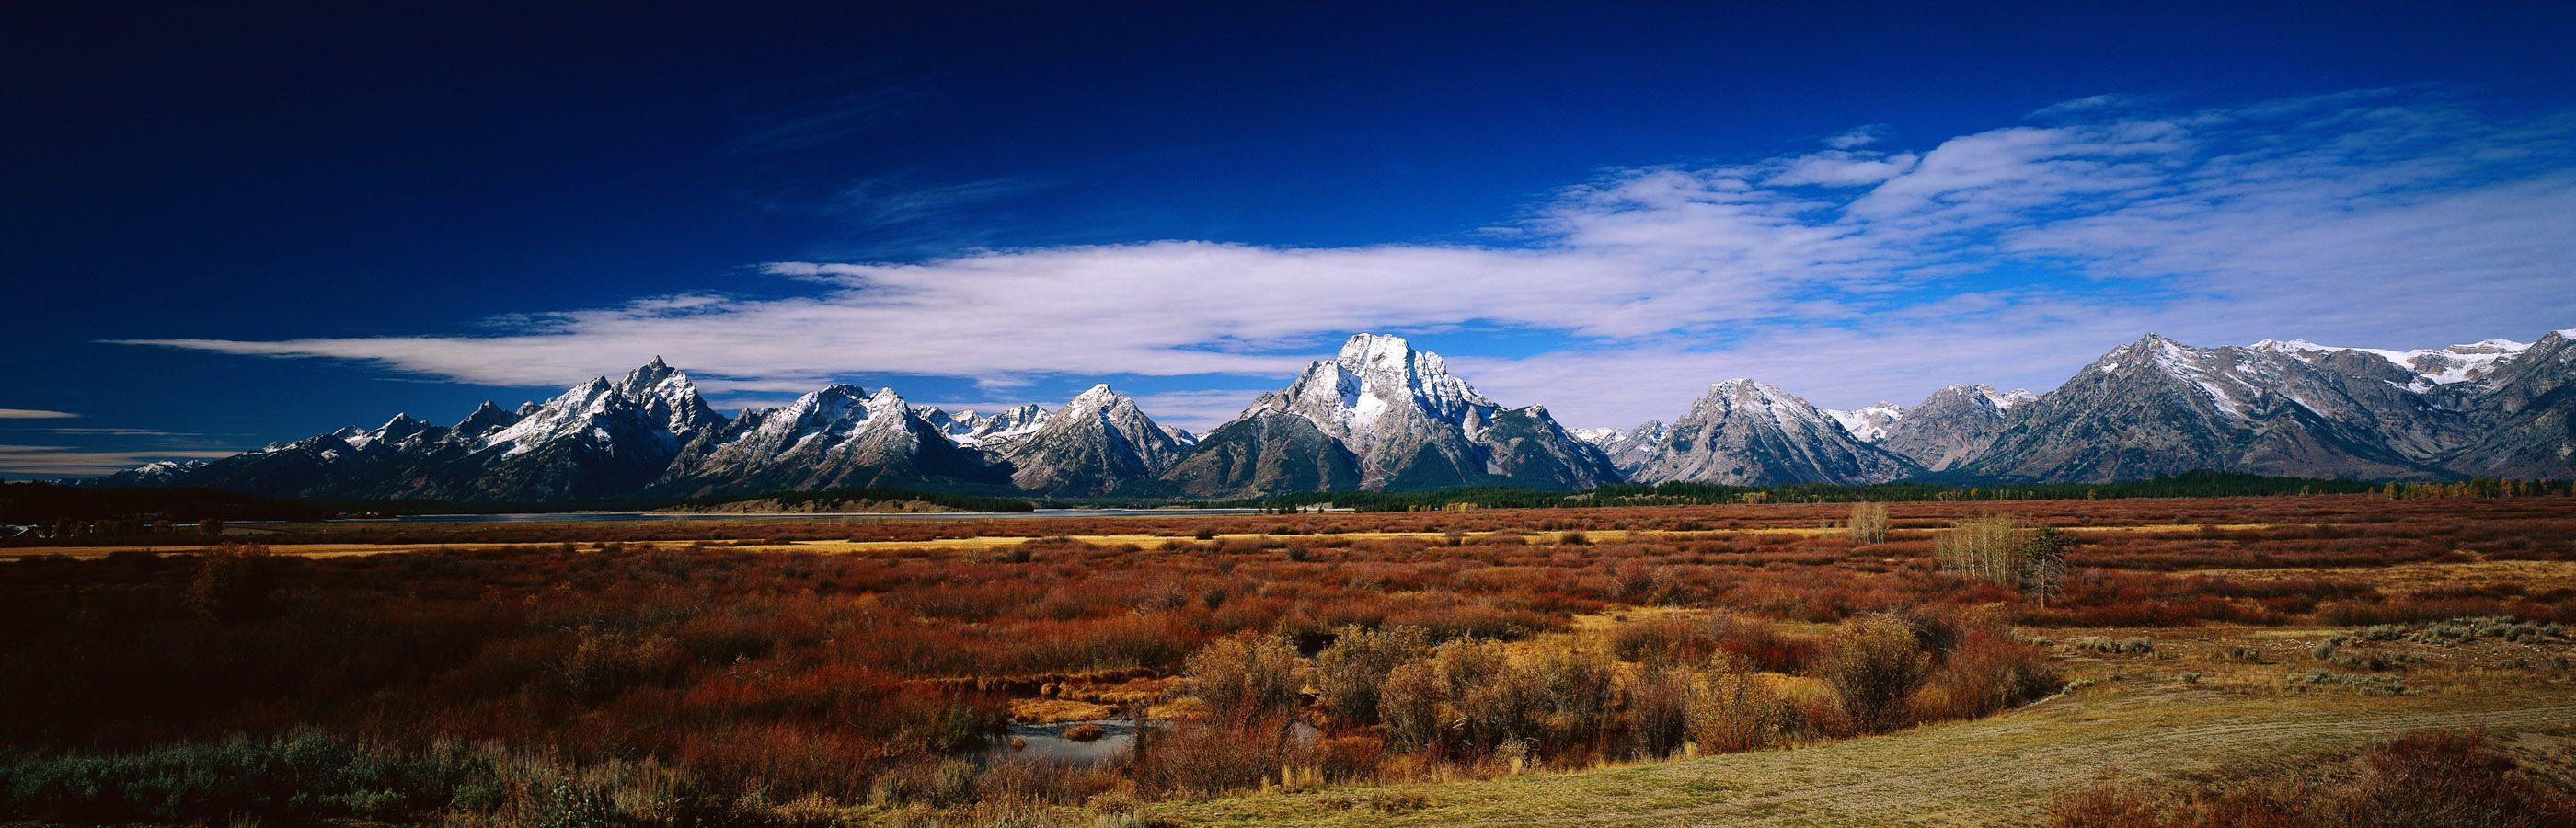 Пейзаж, панорама, горы, живописный